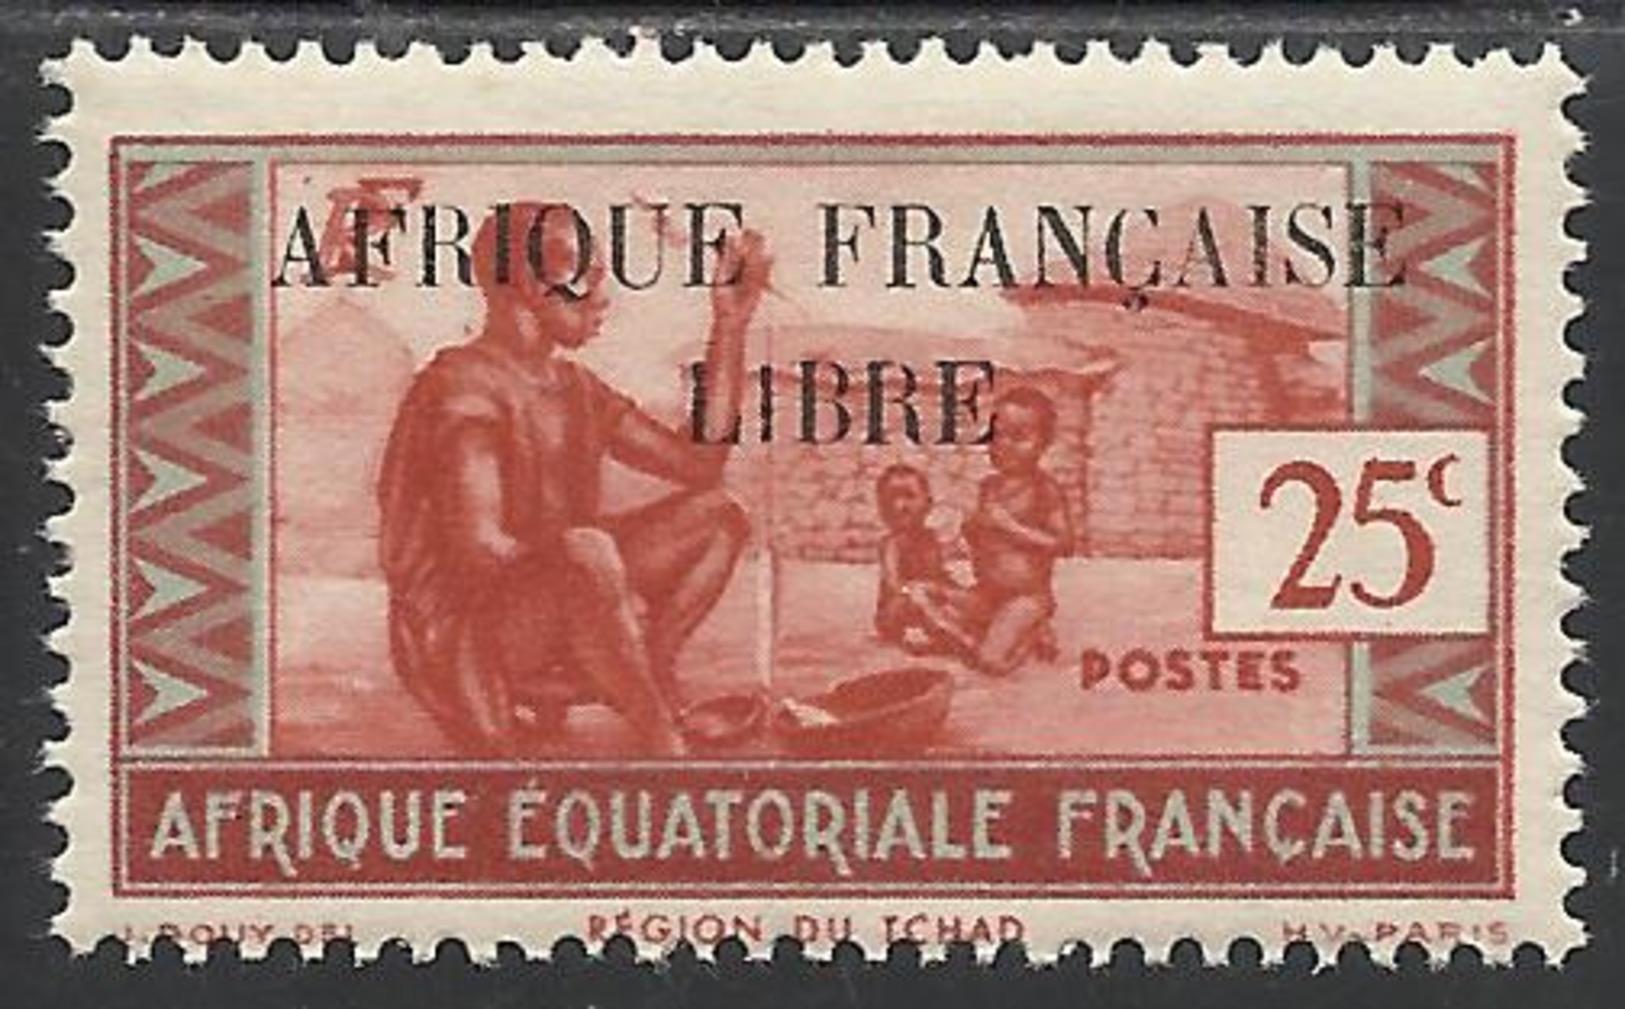 AFRIQUE EQUATORIALE FRANCAISE - AEF - A.E.F. - 1940 - YT 99** - A.E.F. (1936-1958)